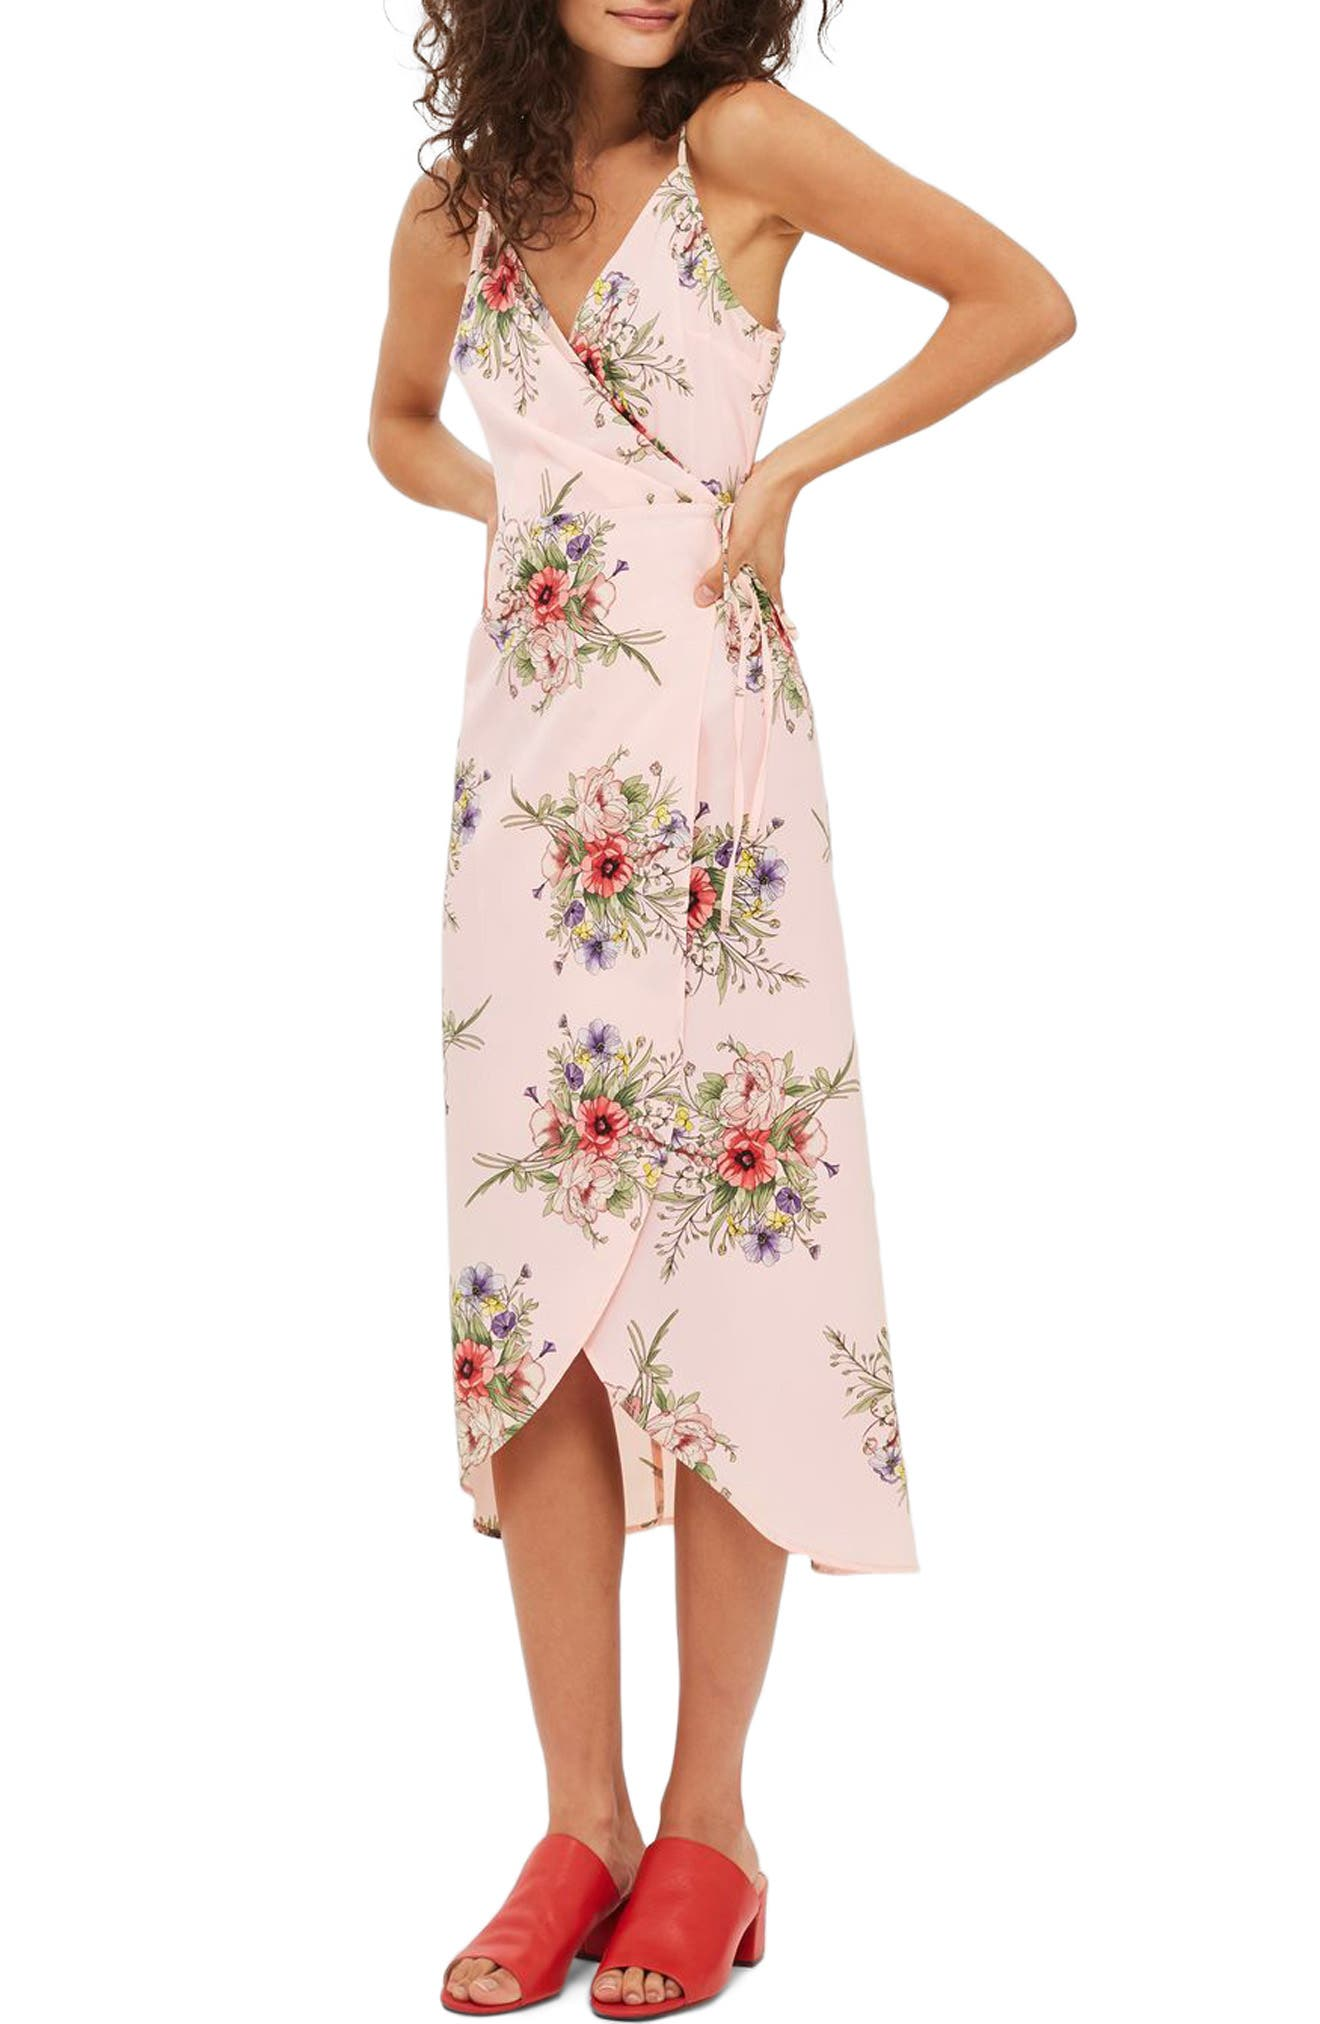 Topshop Floral Wrap Slipdress